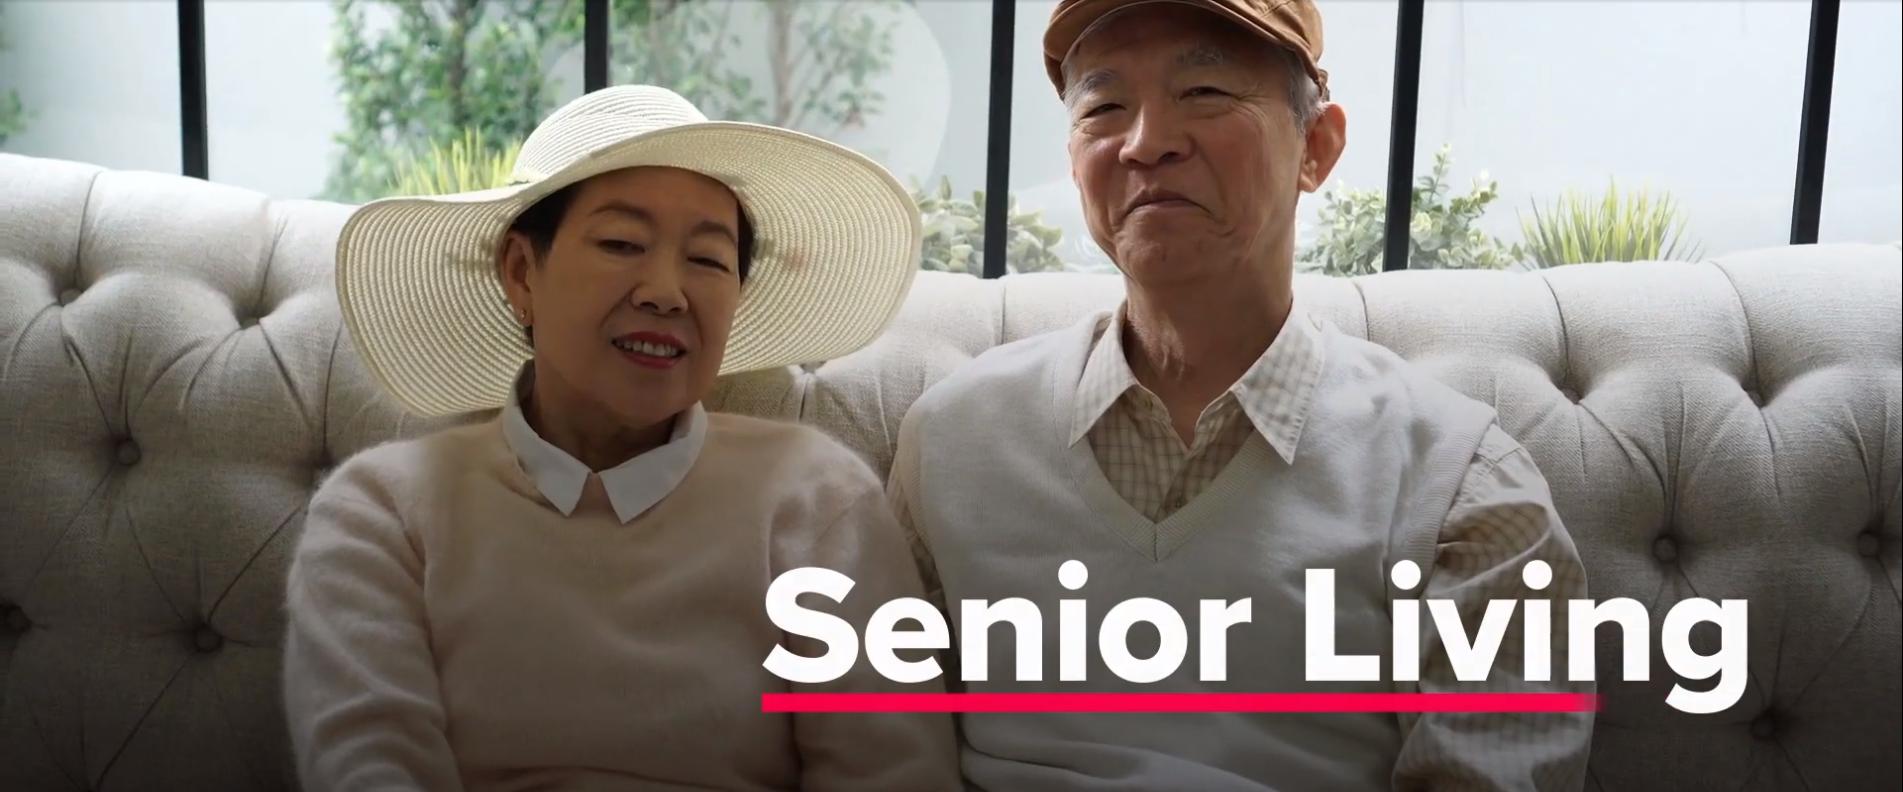 Senior Living Image 8-5-20